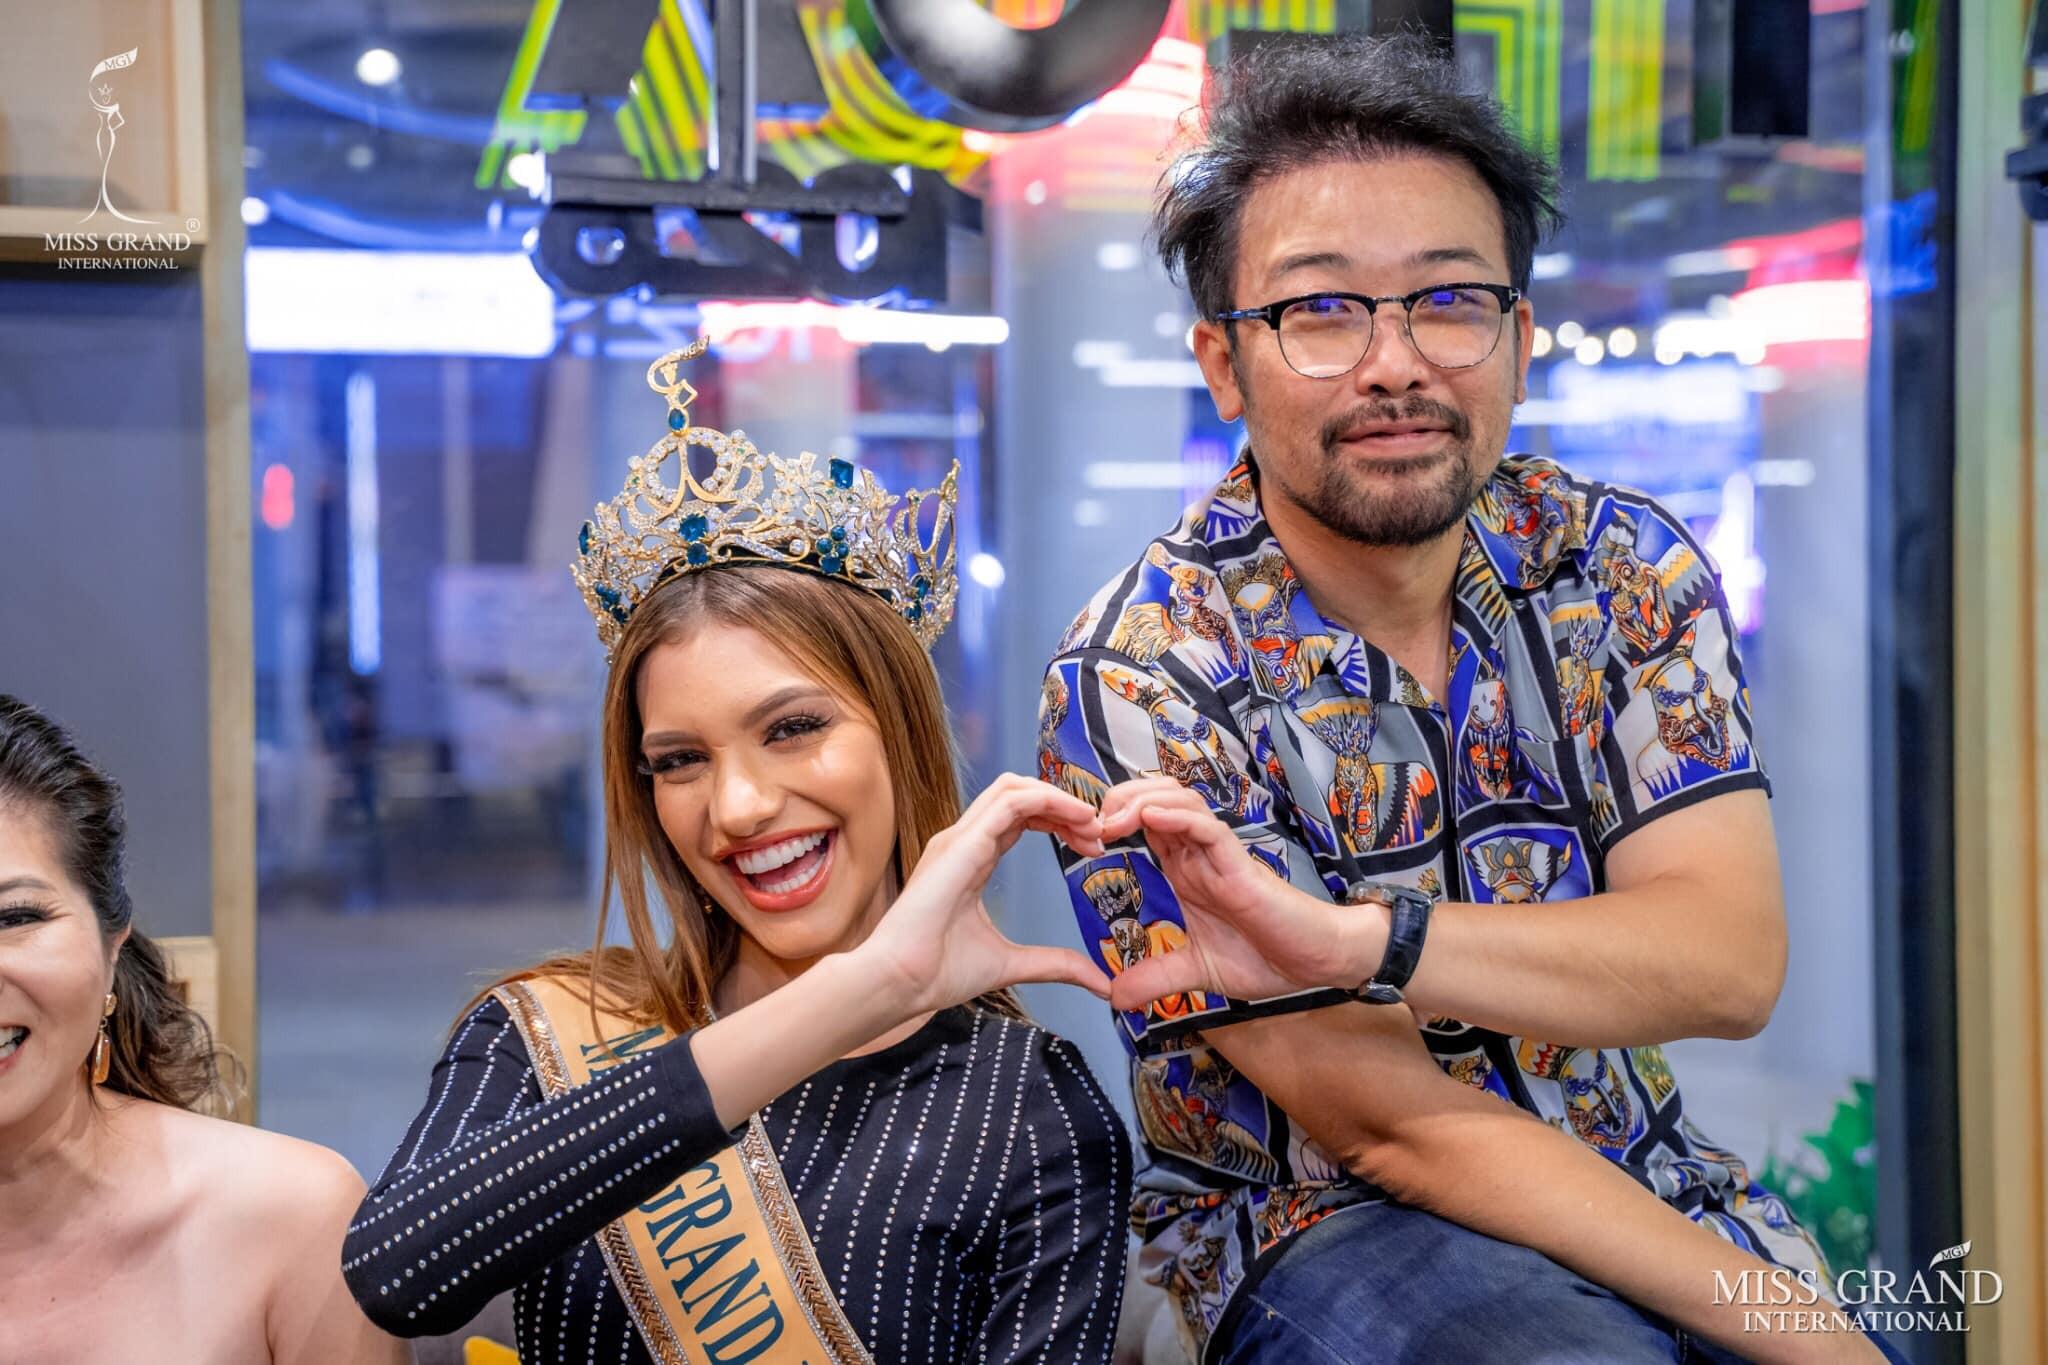 lourdes valentina figuera, miss grand international 2019. - Página 22 Fev2pv10